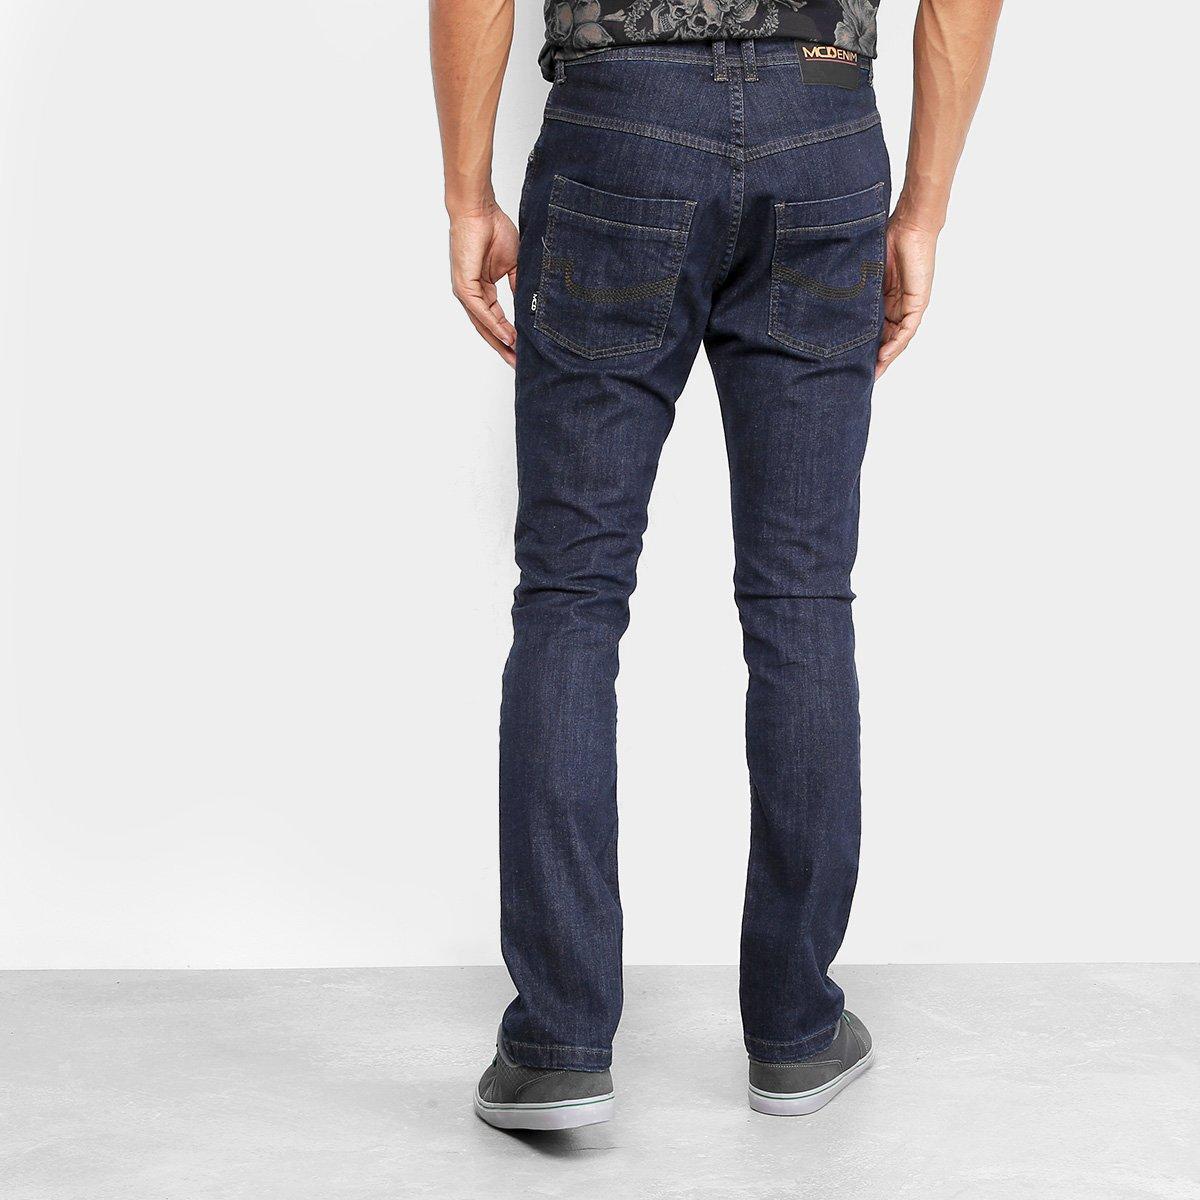 Calça Jeans MCD Denim New Slim Basic Masculina - Compre Agora  bfb87f9c3ea